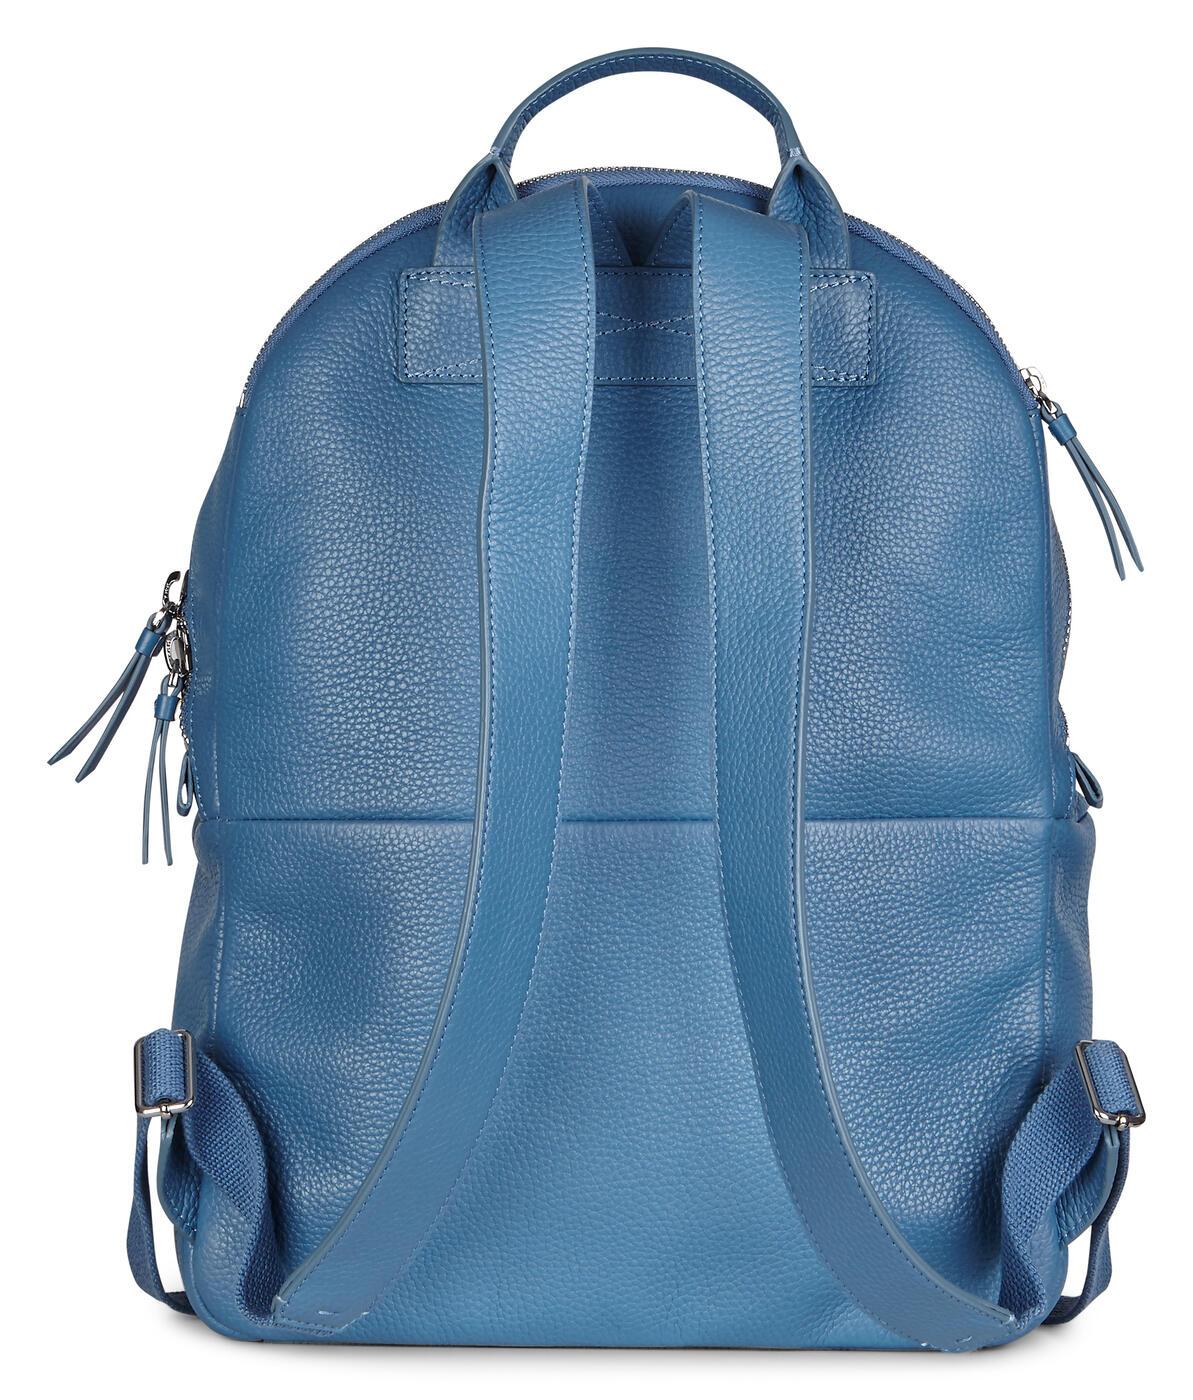 ECCO SP3 Large Backpack